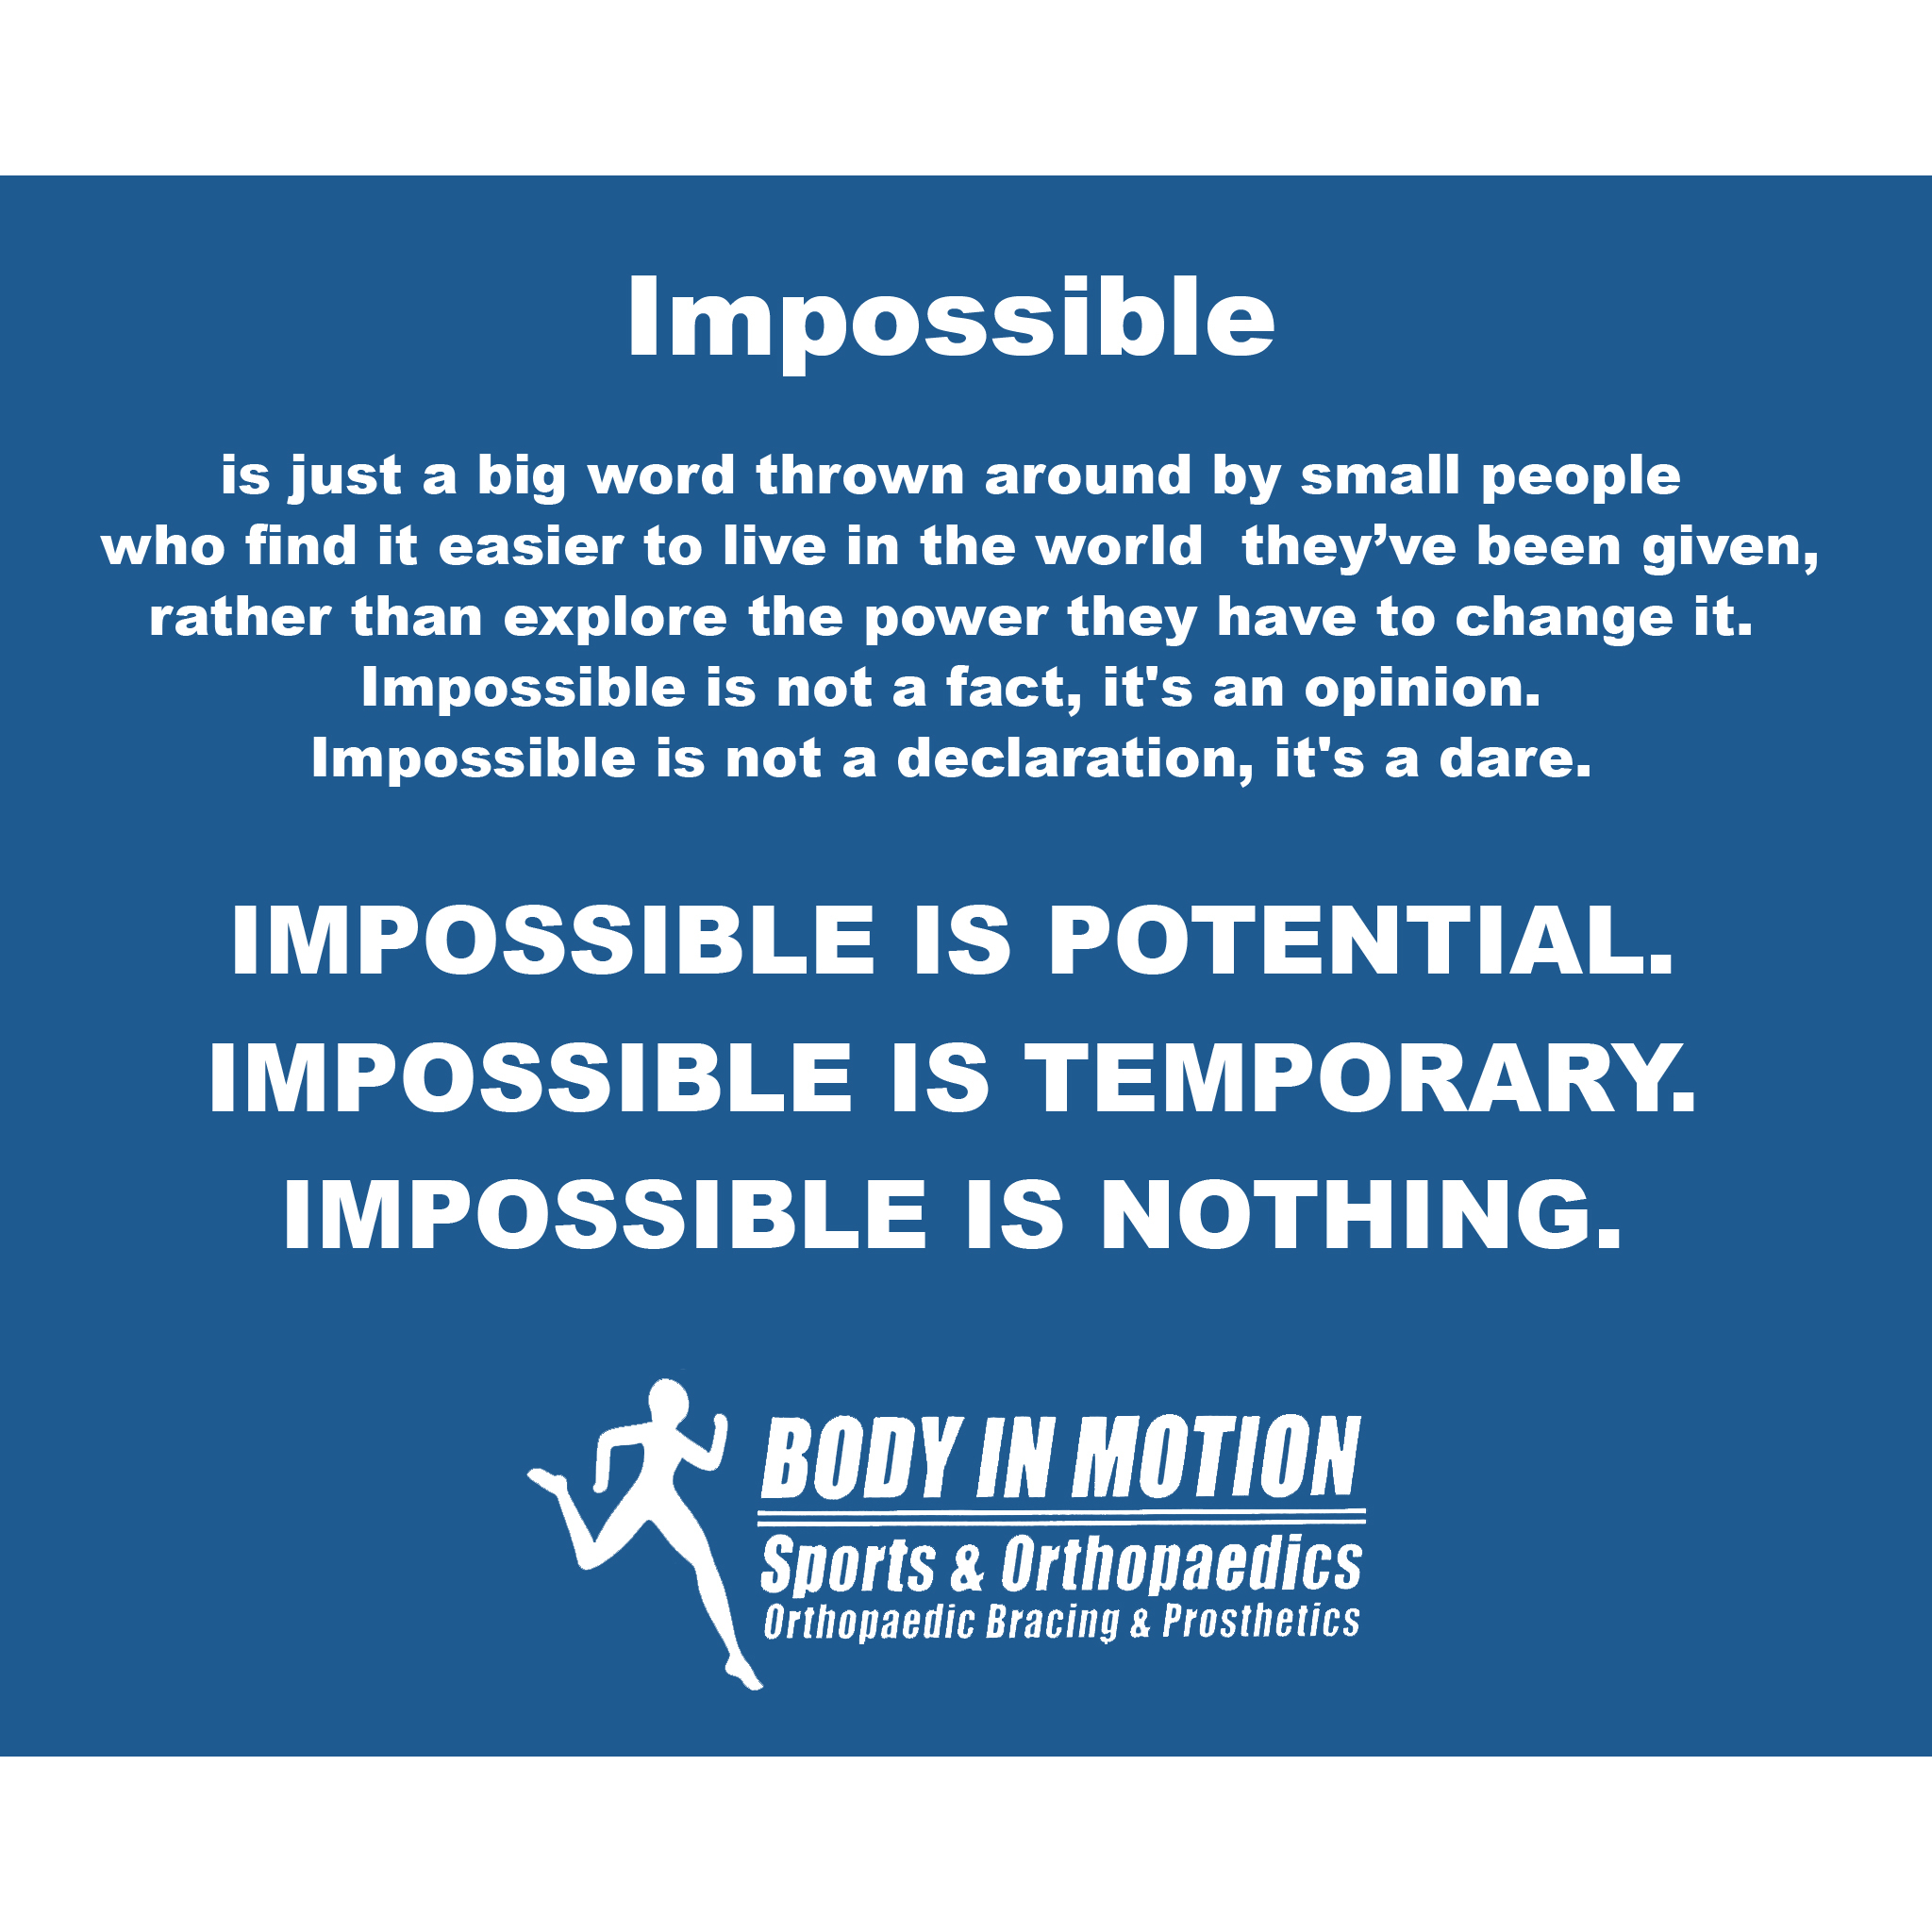 Body In Motion Sports & Orthopedics